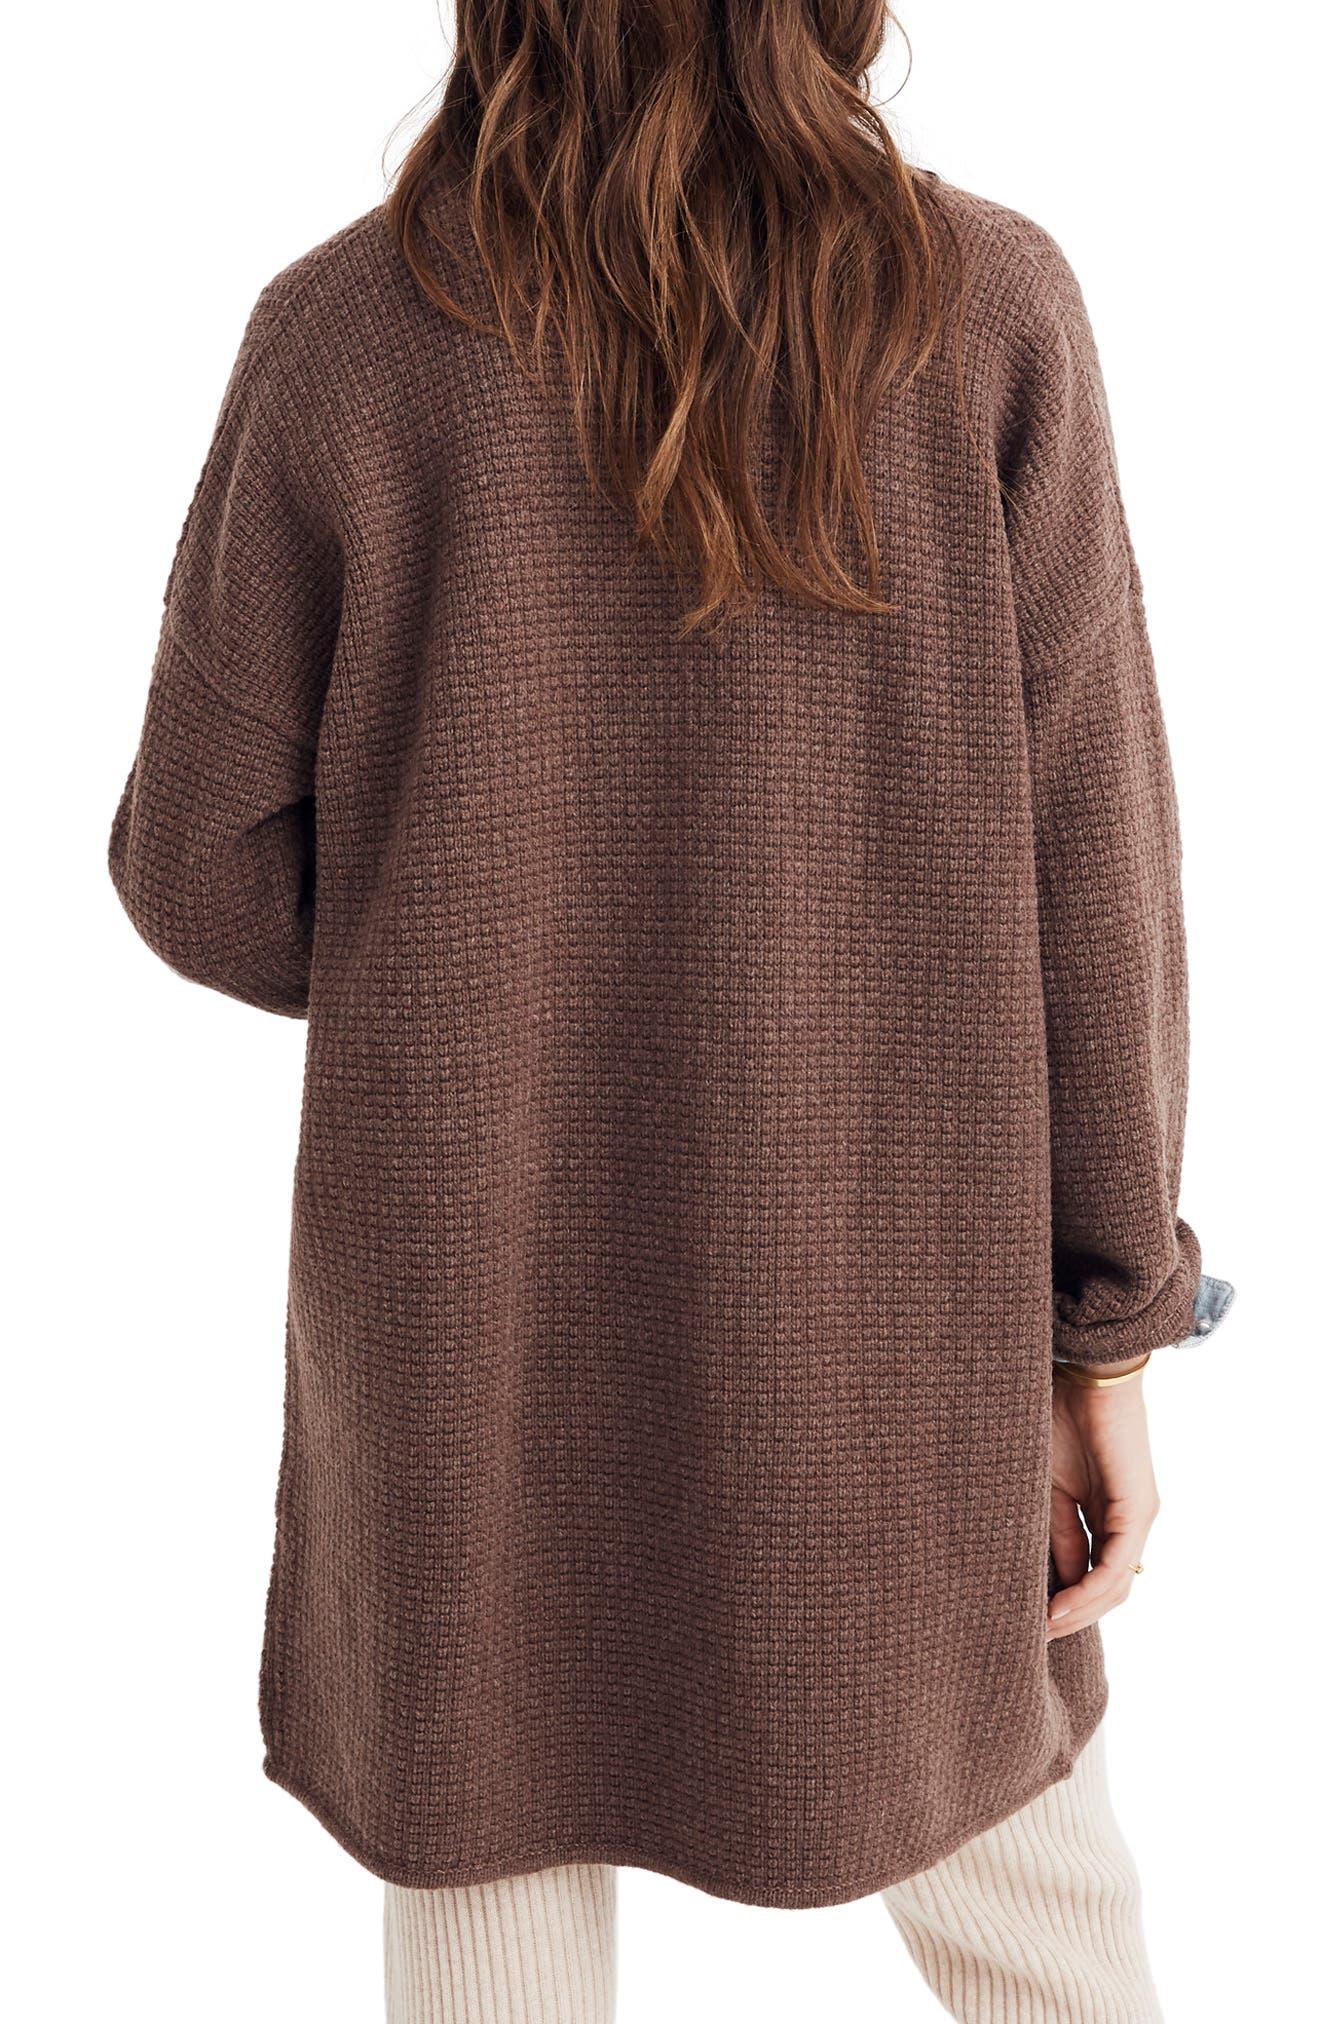 Chilton Sweater Coat,                             Alternate thumbnail 2, color,                             HEATHER COCOA